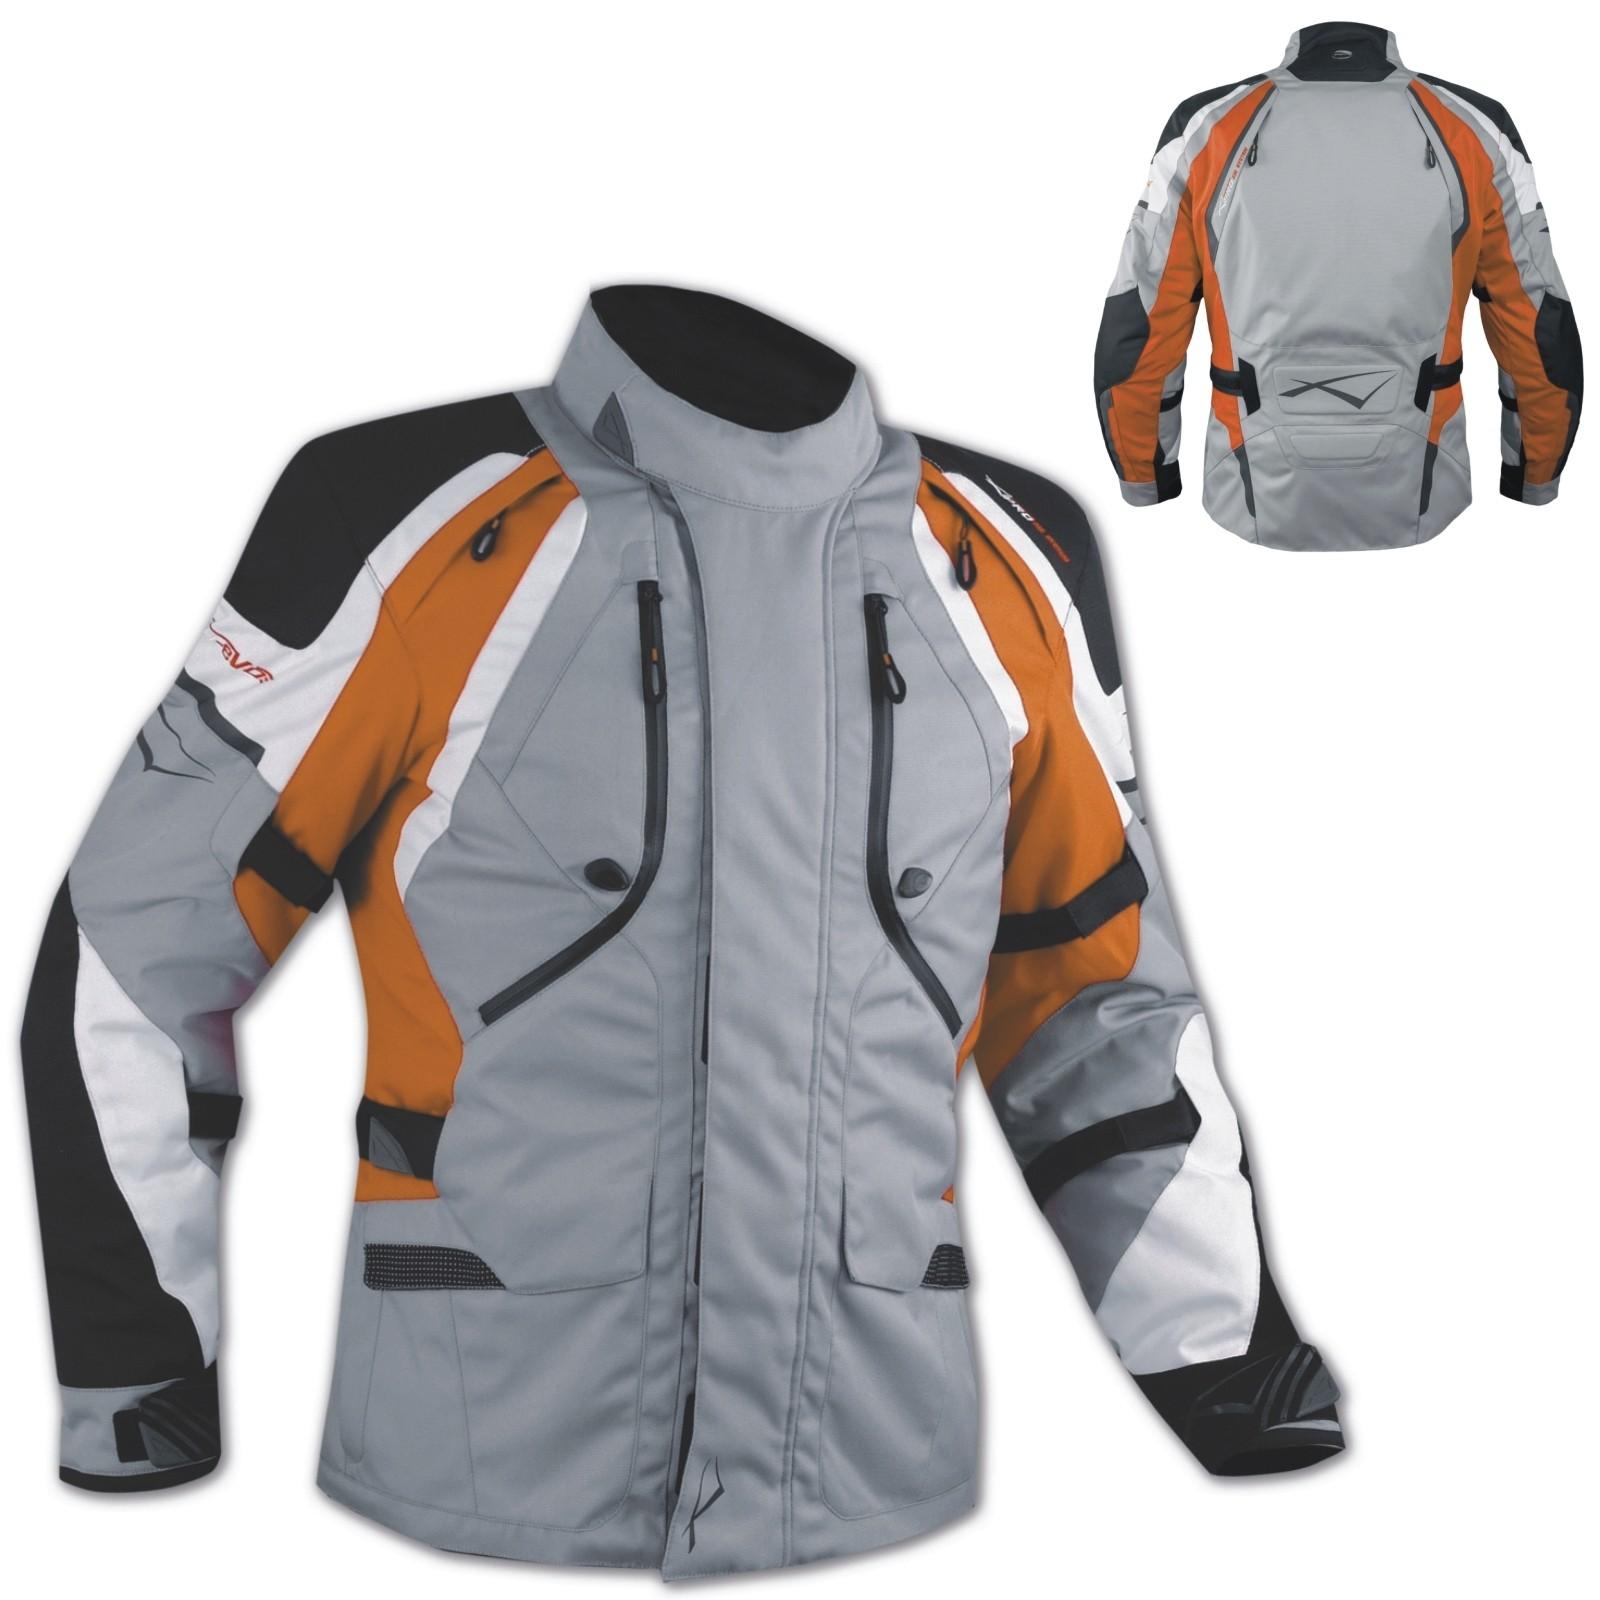 Textiljacke Motorrad Touring Protektoren Thermofutter Wasserdicht Orange